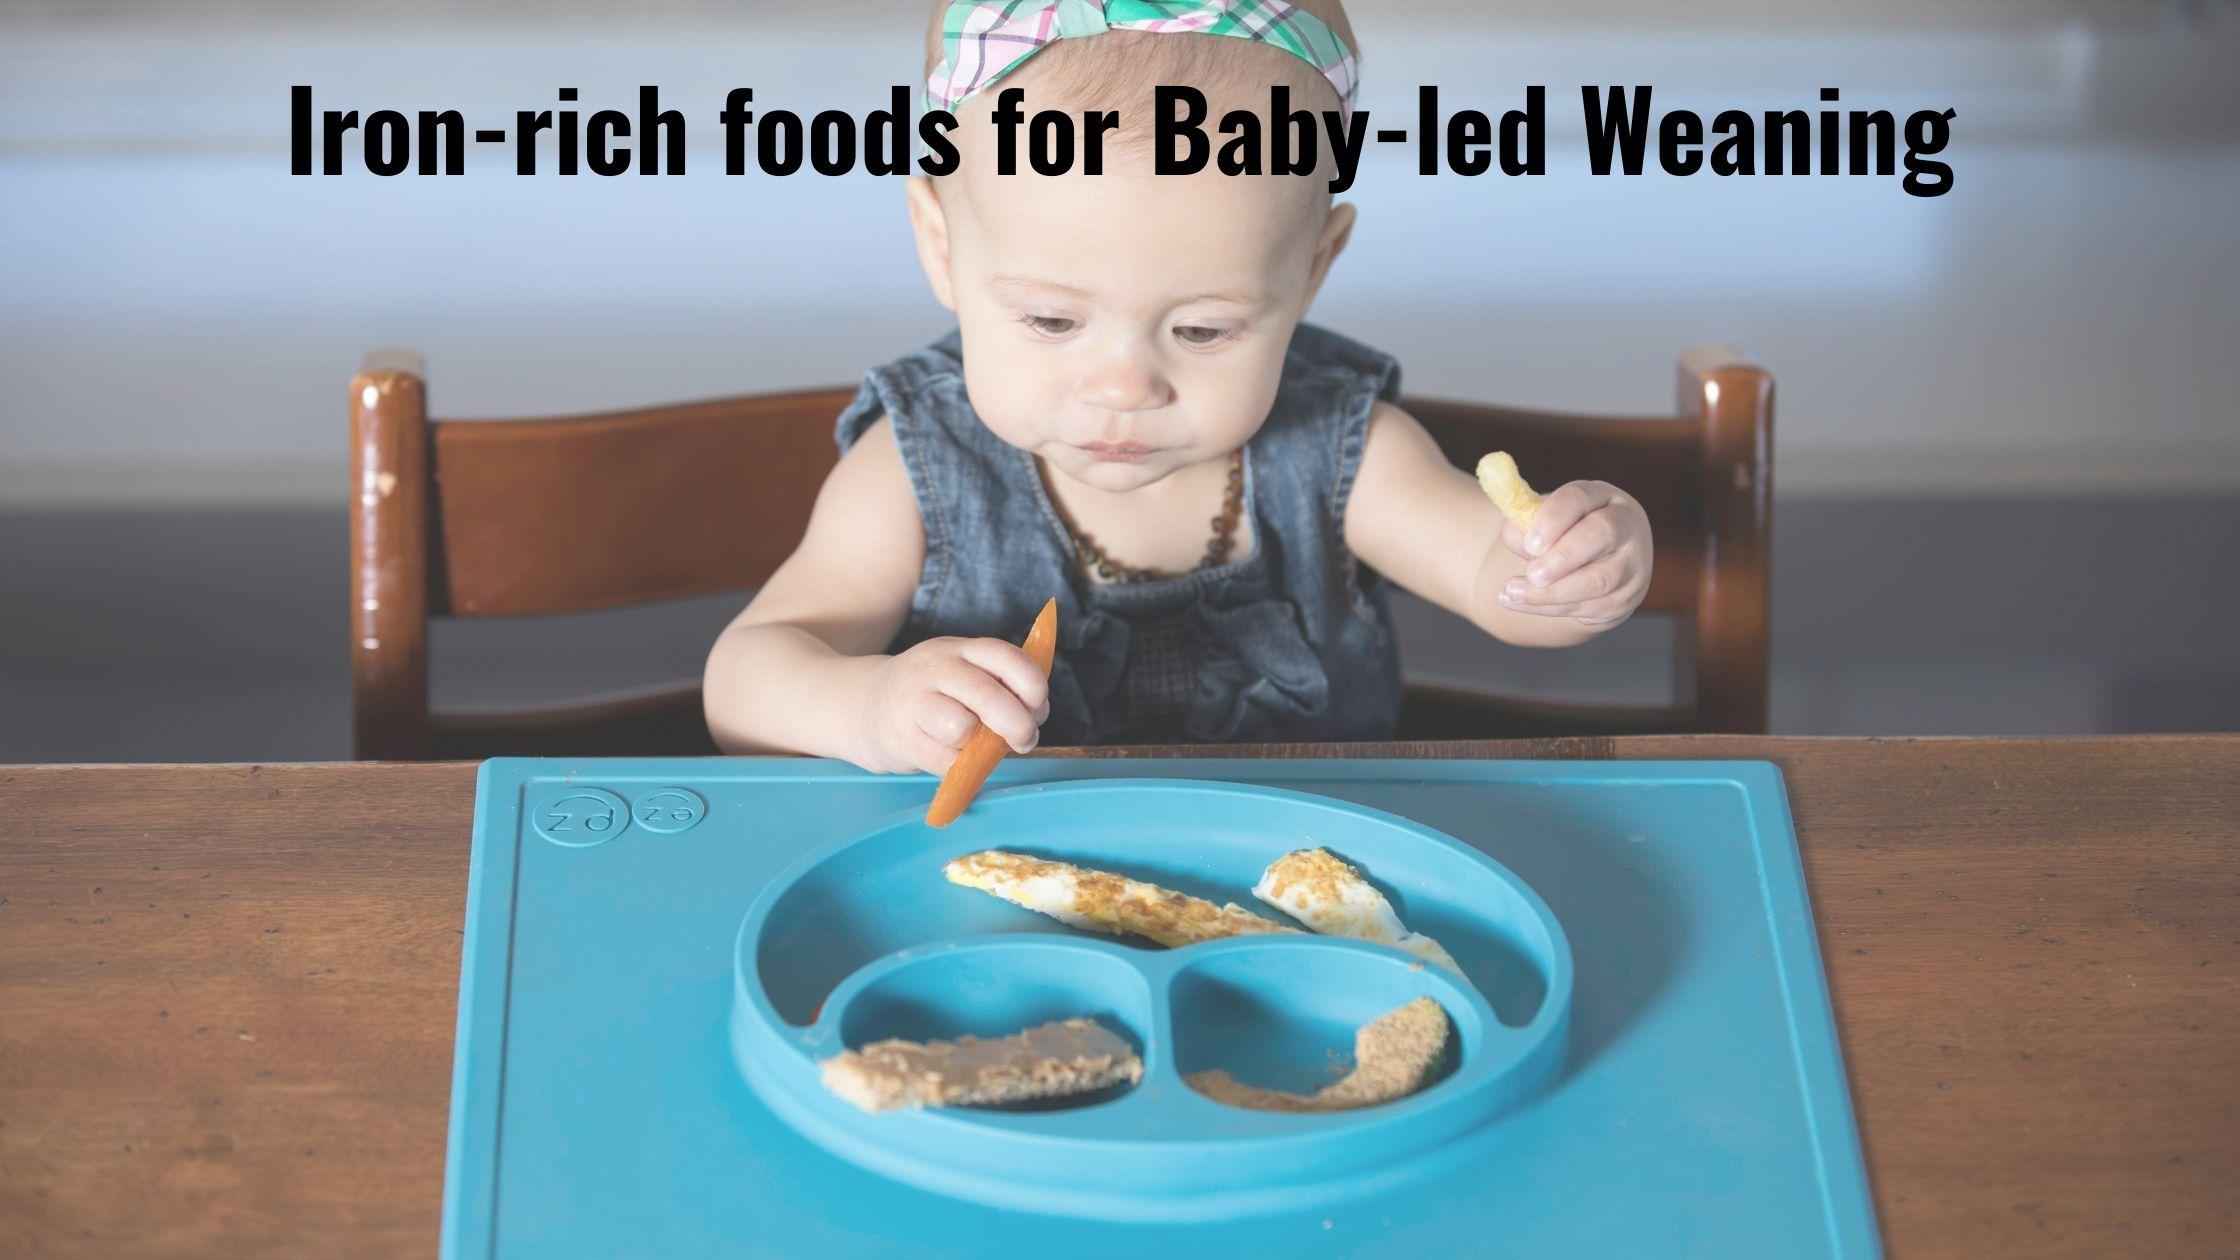 baby feeding herself iron-rich foods